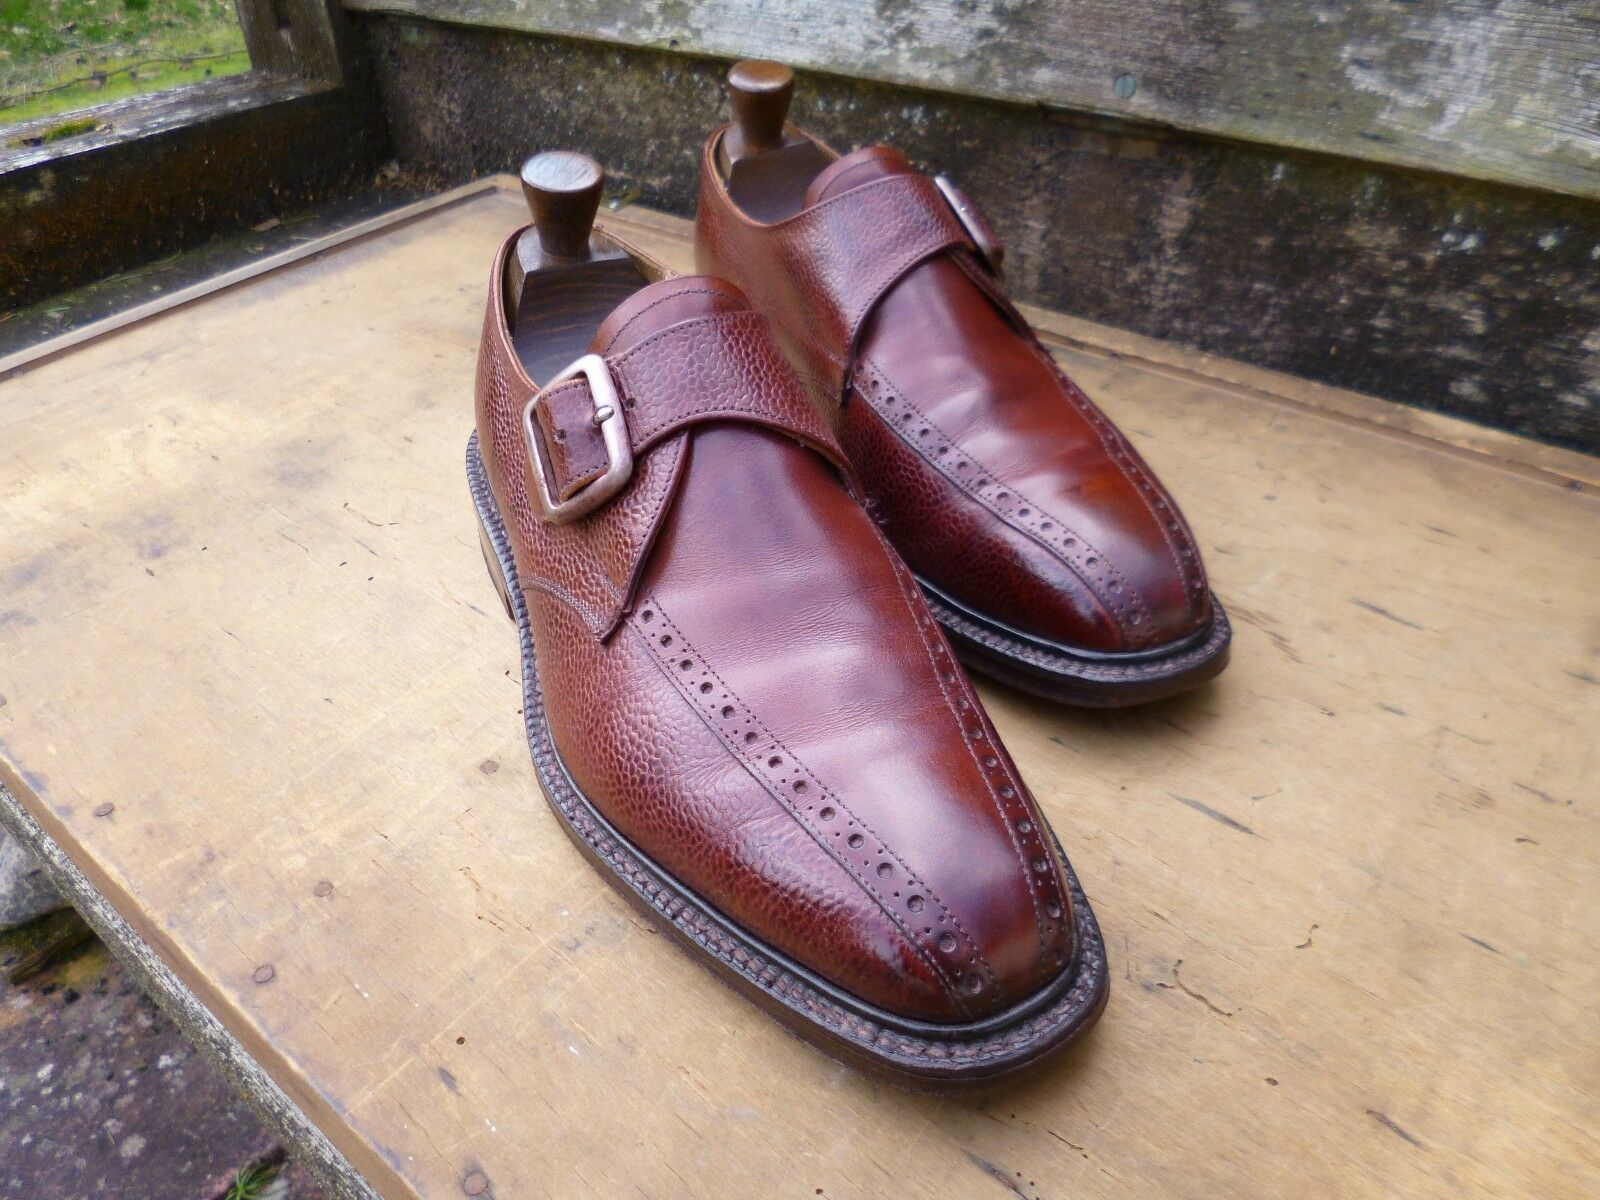 CHEBNEY / CHURCH MONK STRBP – BROWN / TBN – UK 7.5 – GOUGH-EXCELLENT  CONDITION